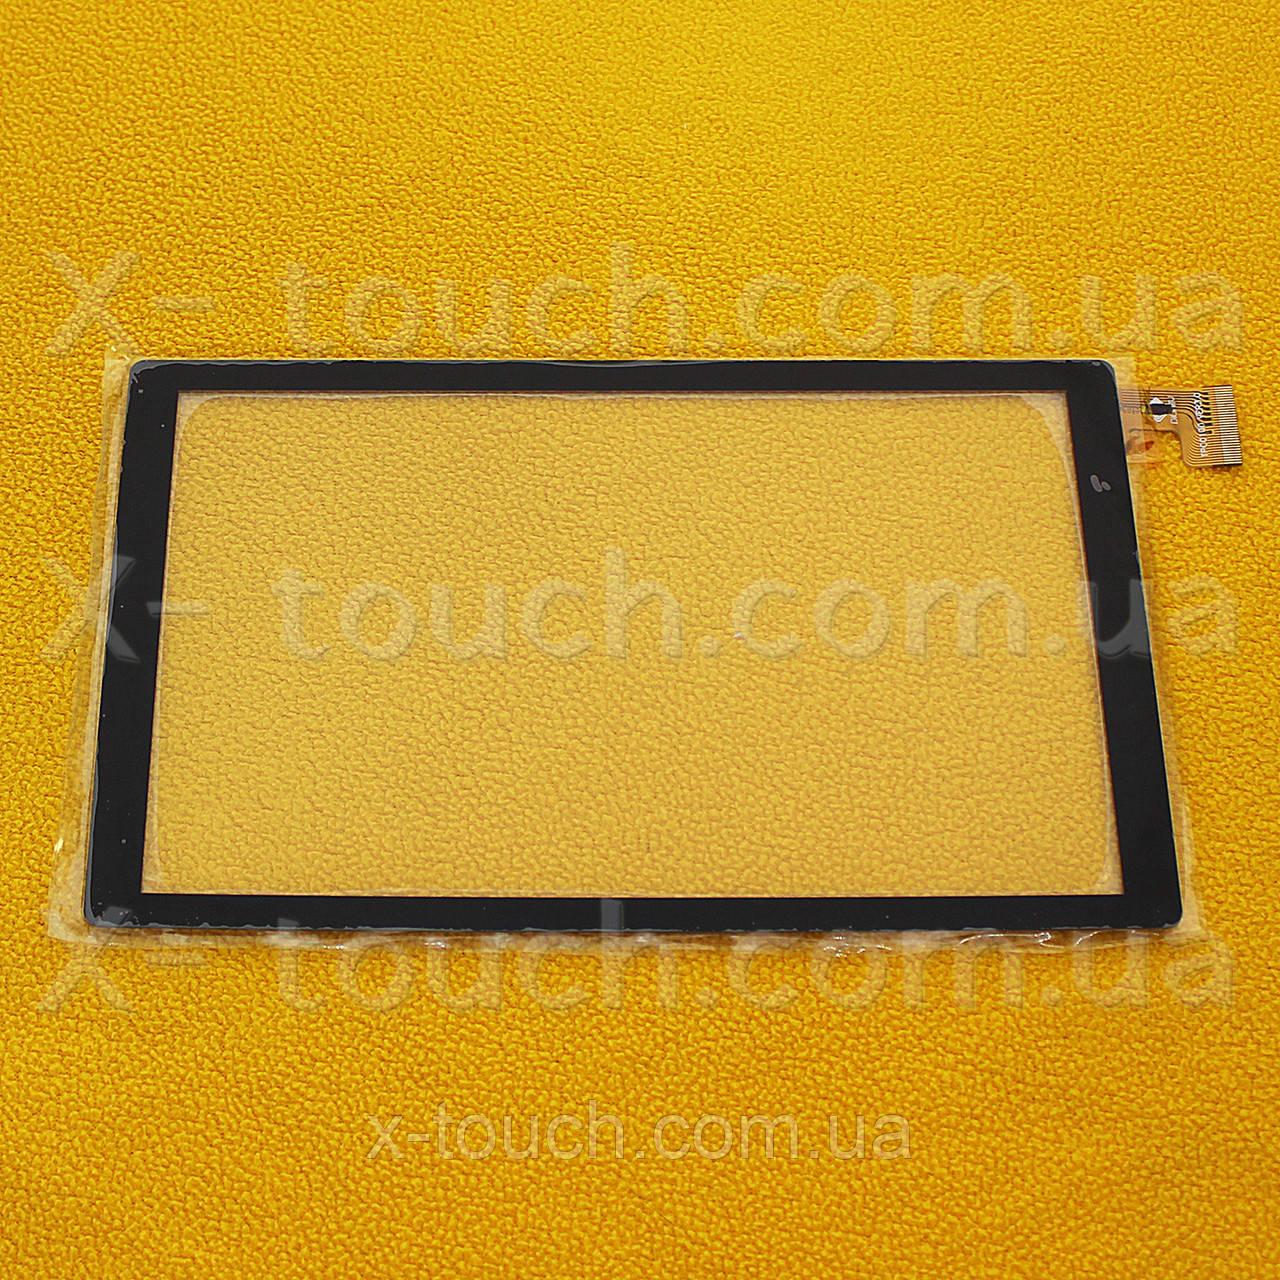 Тачскрин, сенсор  DIGNITY TPC0100 VER3.0  для планшета